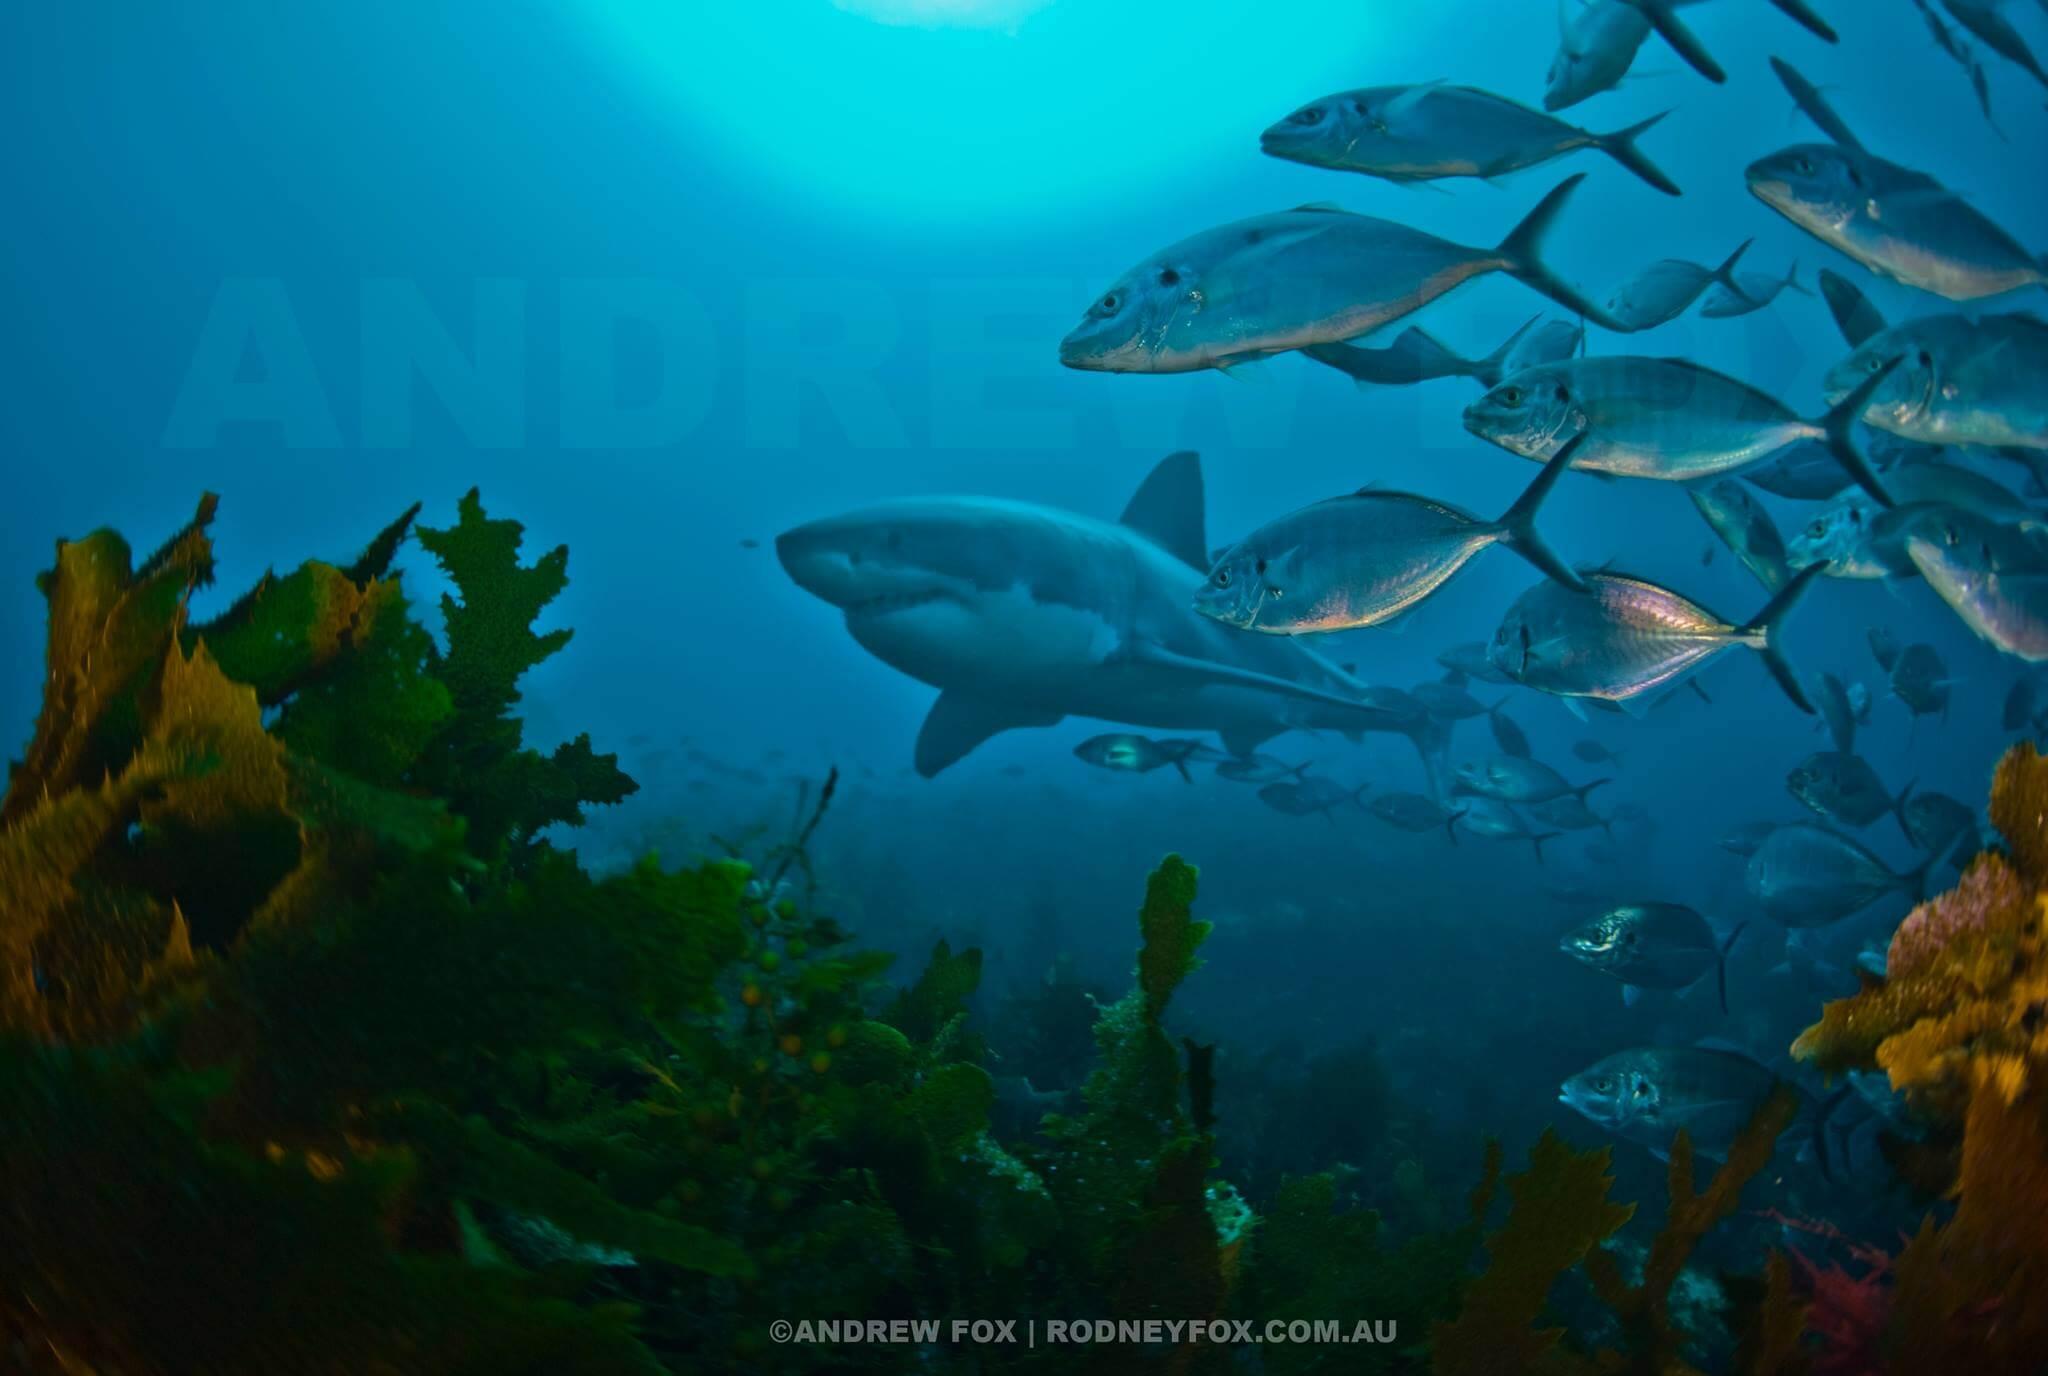 fotos-gratis-de-arrecifes-de-coral